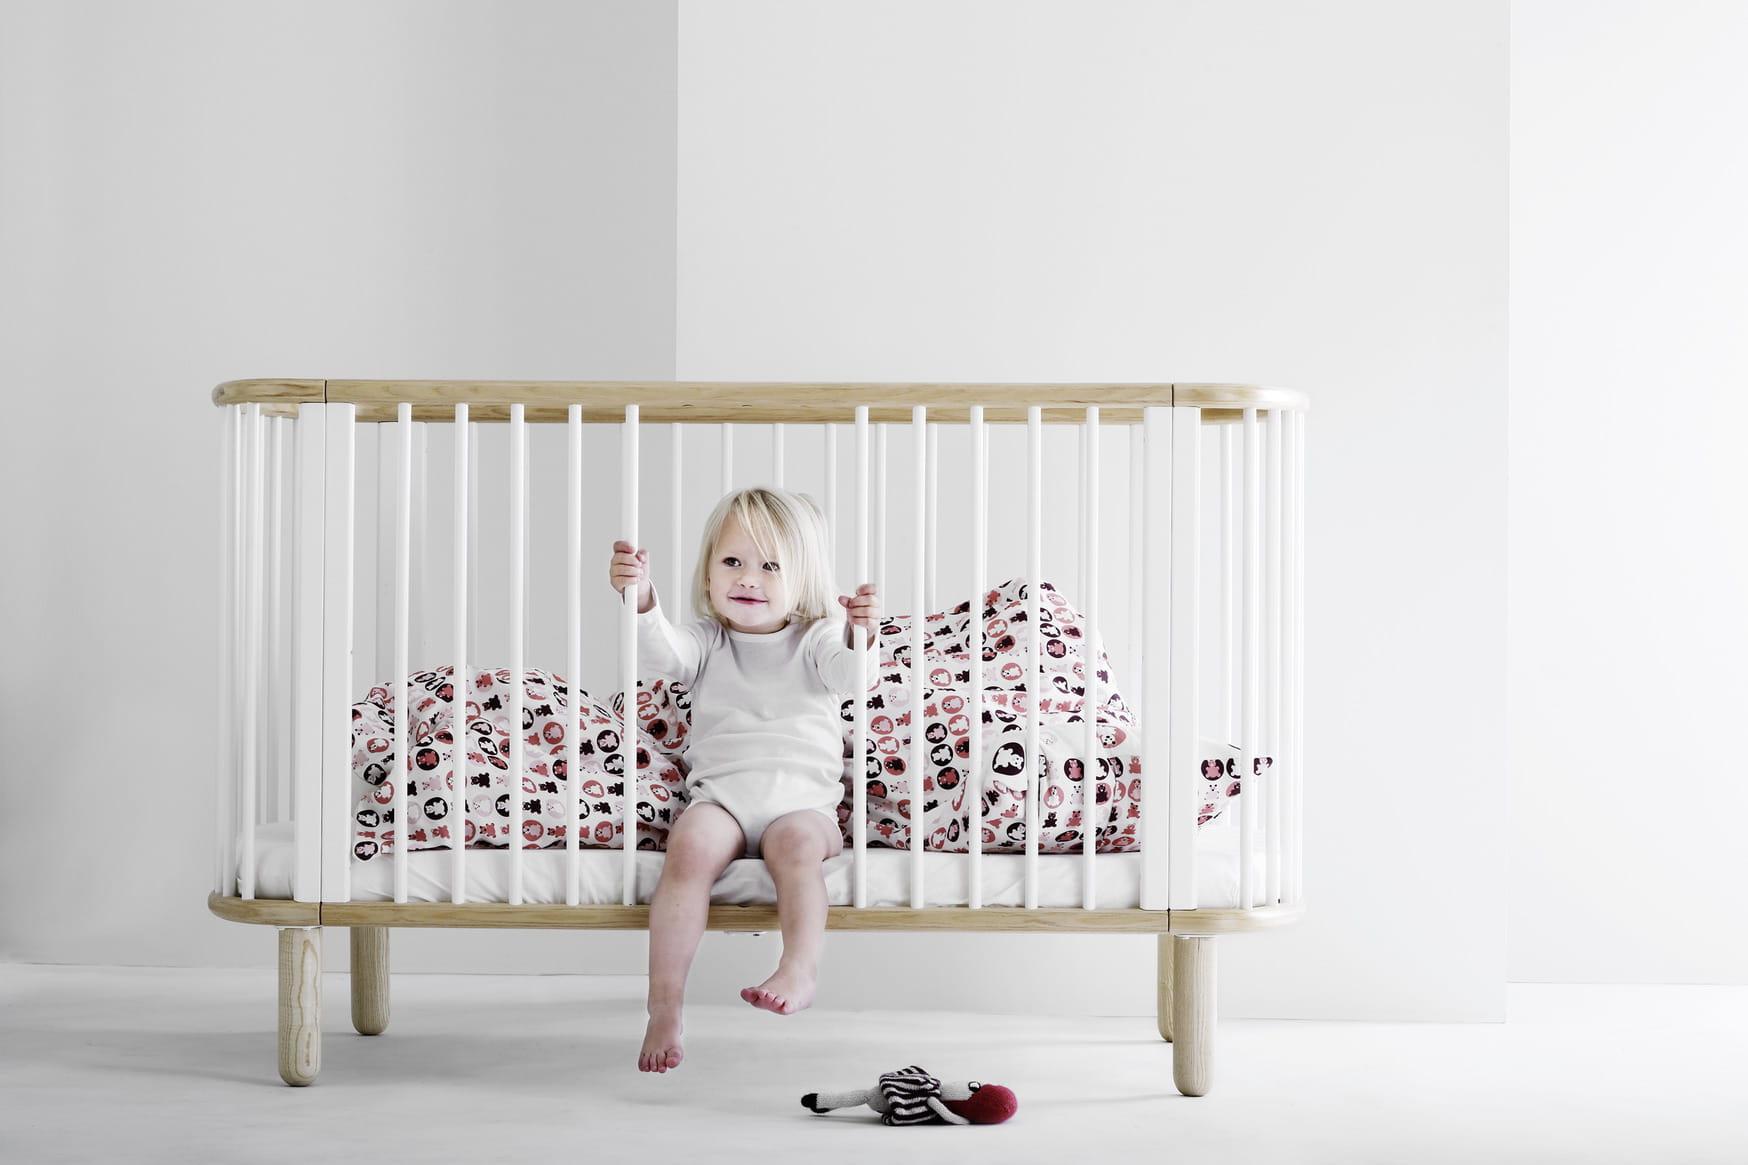 Lit de b b volutif de flexa 22 lits berceaux et autres couffins pour b b - Berceau bebe evolutif ...